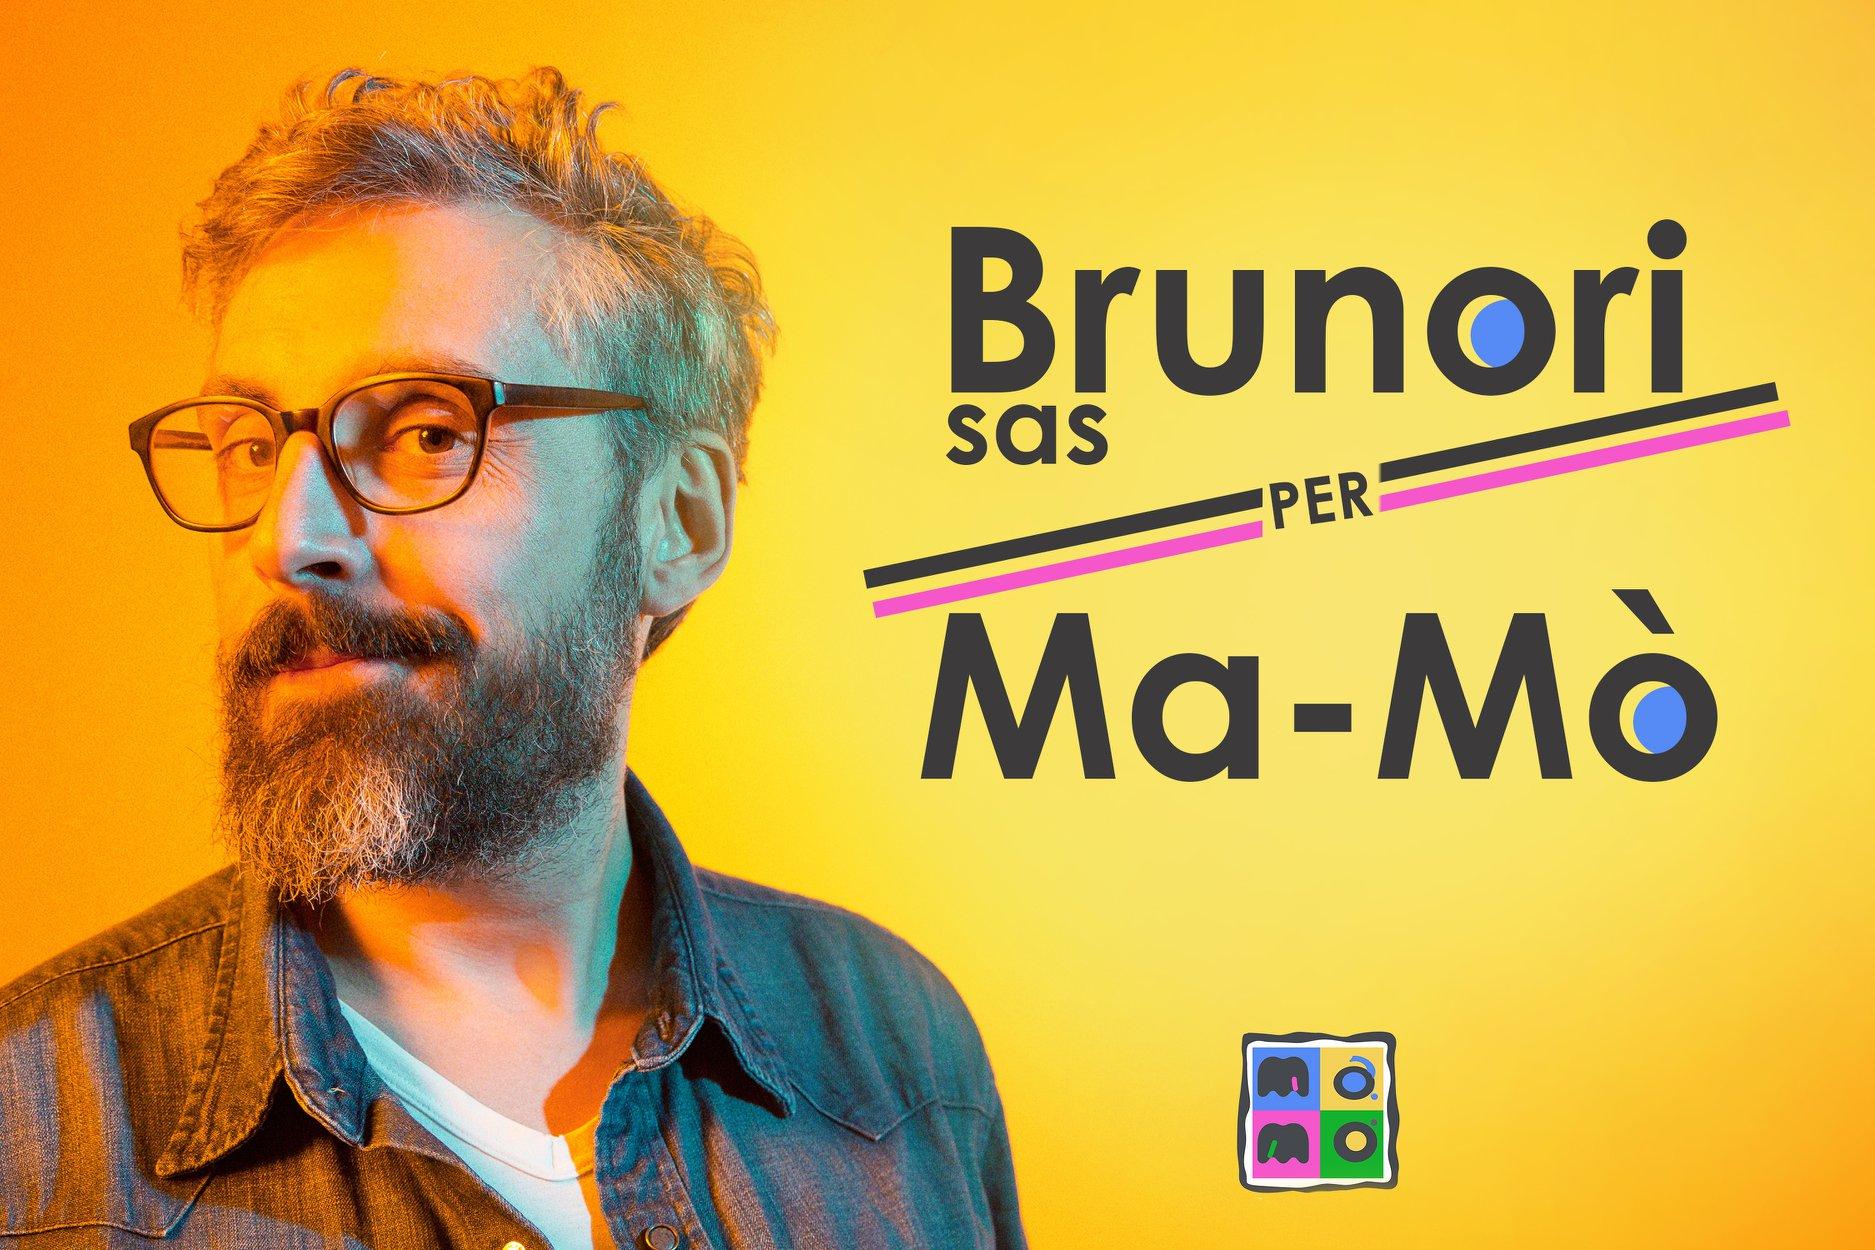 Brunori sas per Ma-Mo'